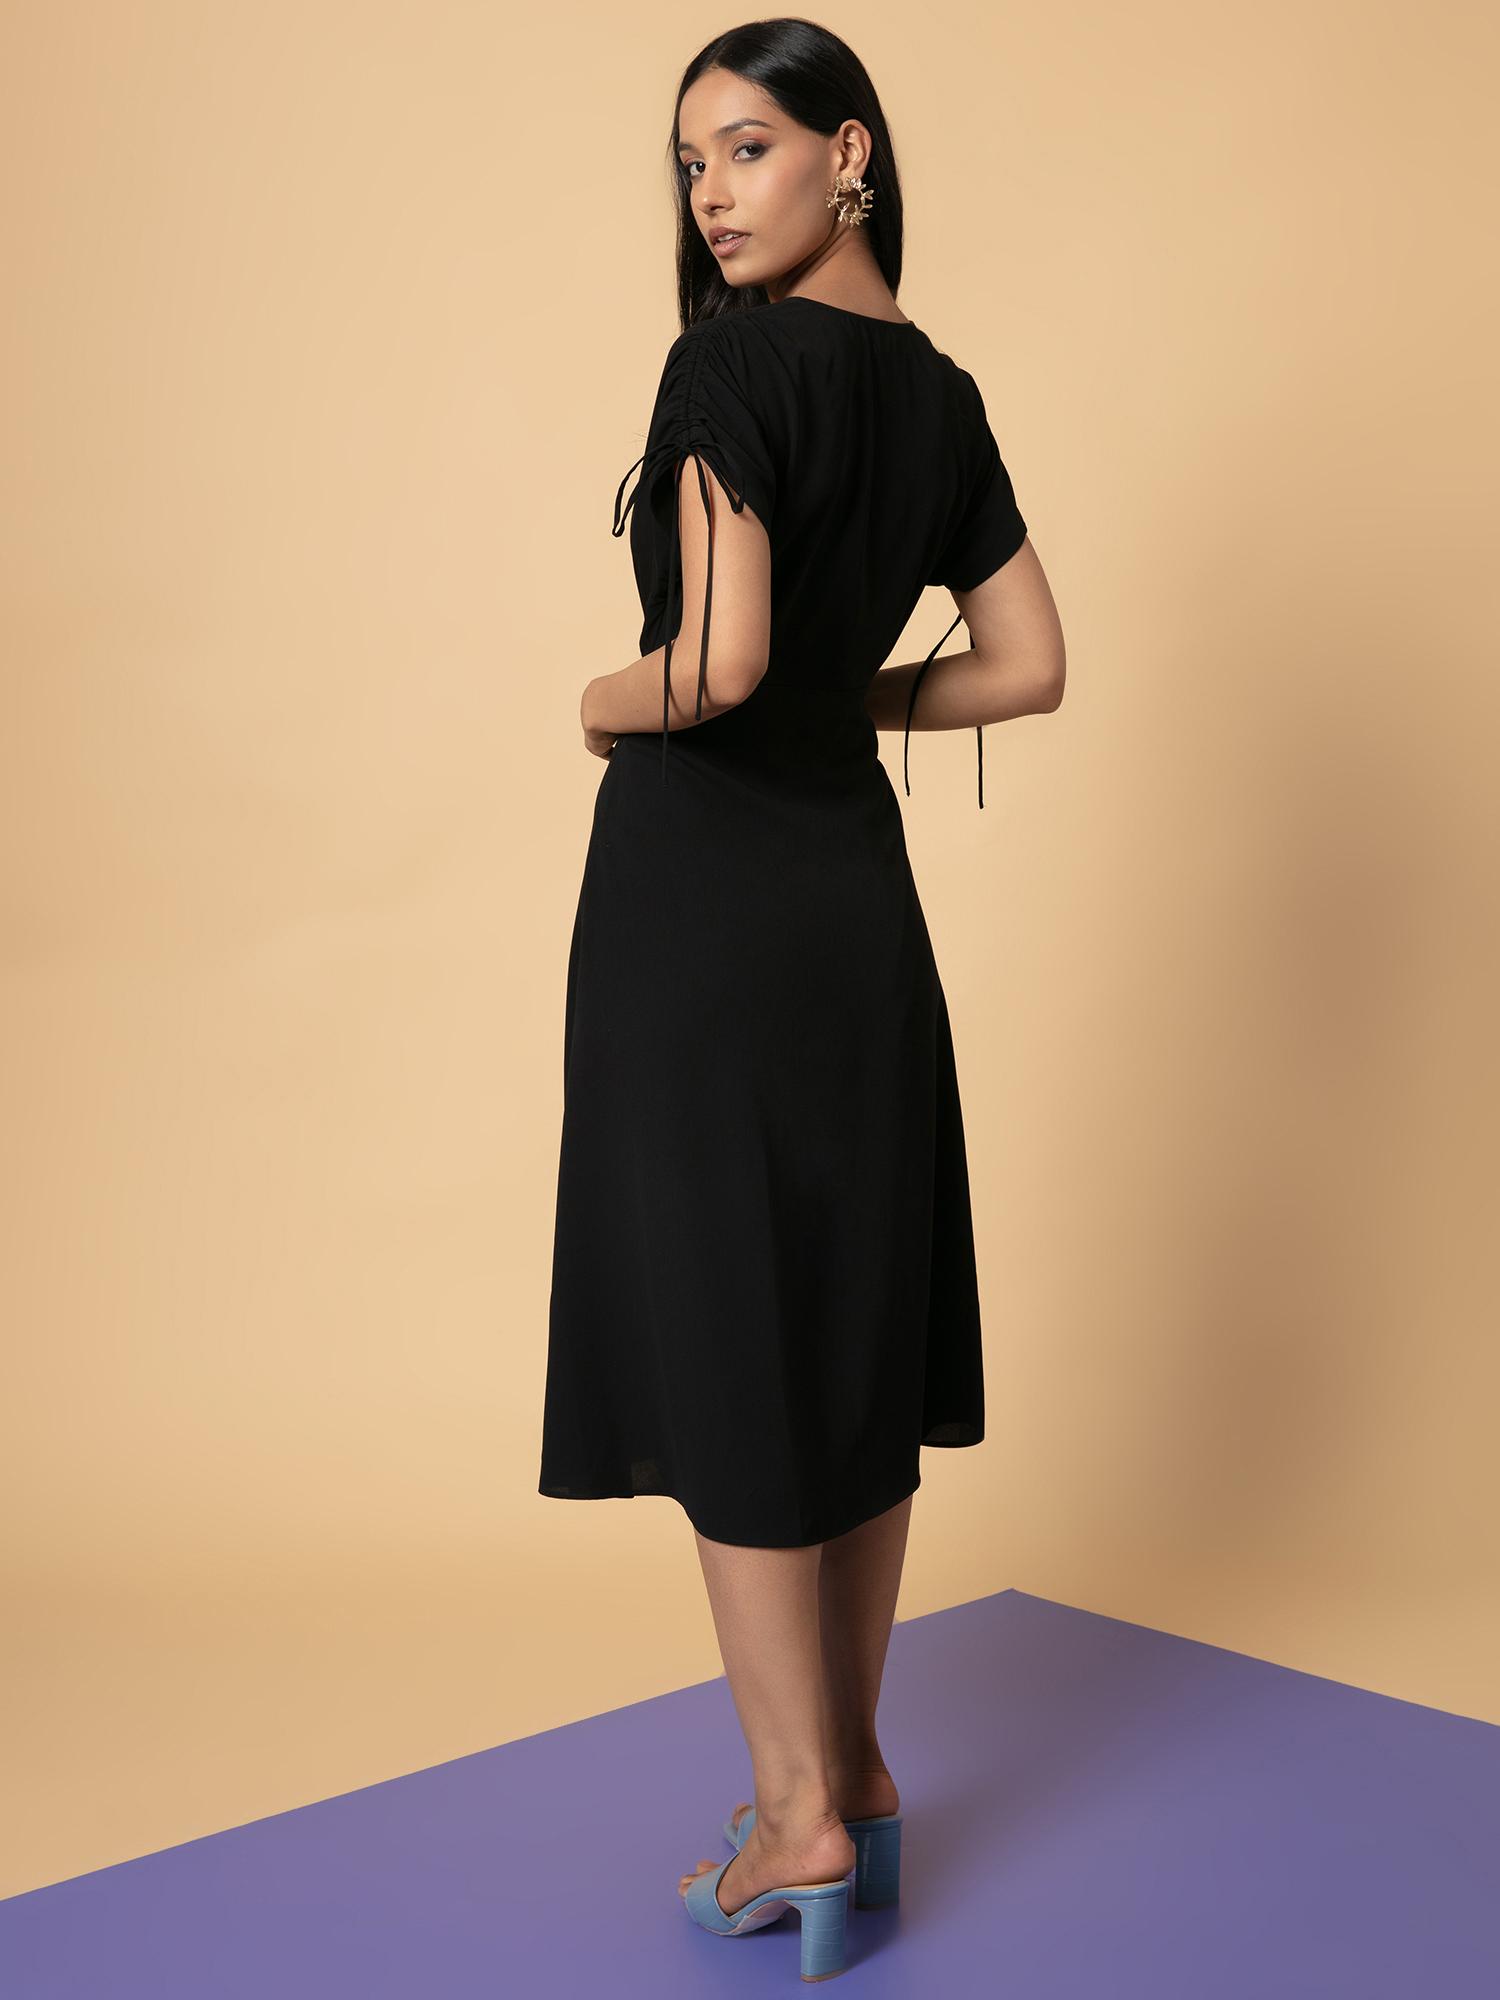 Dresses-Make Your Mark Dress2